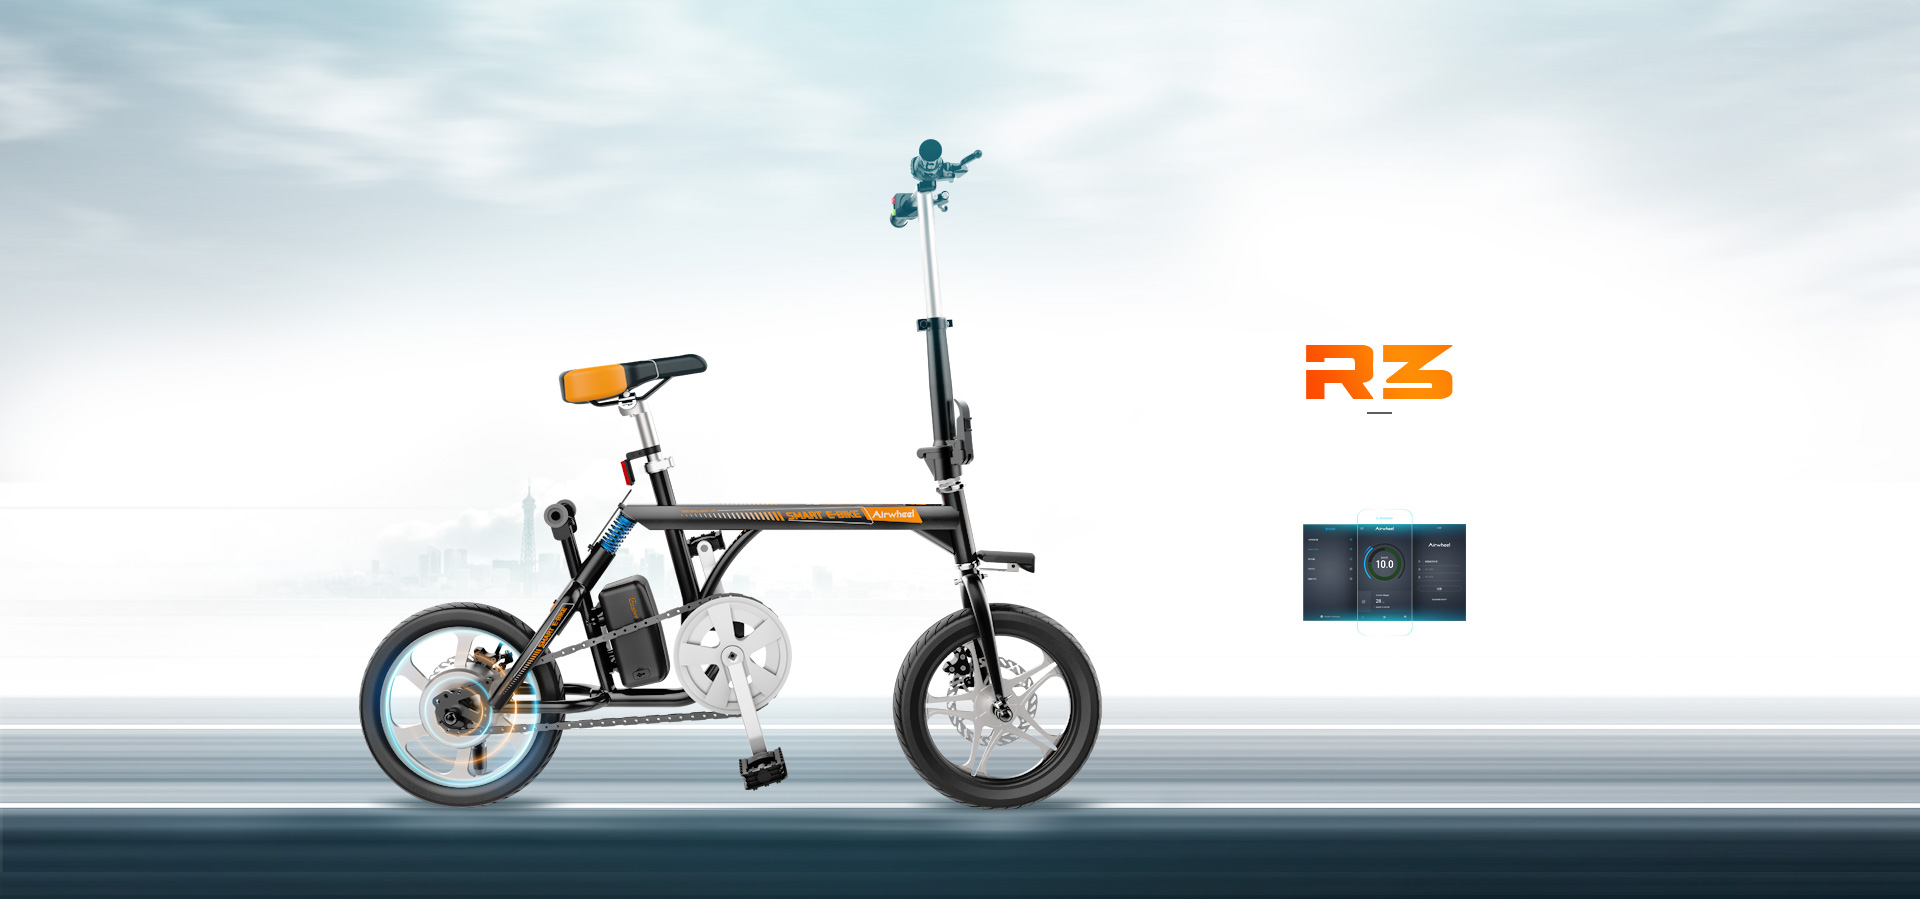 Airwheel R3